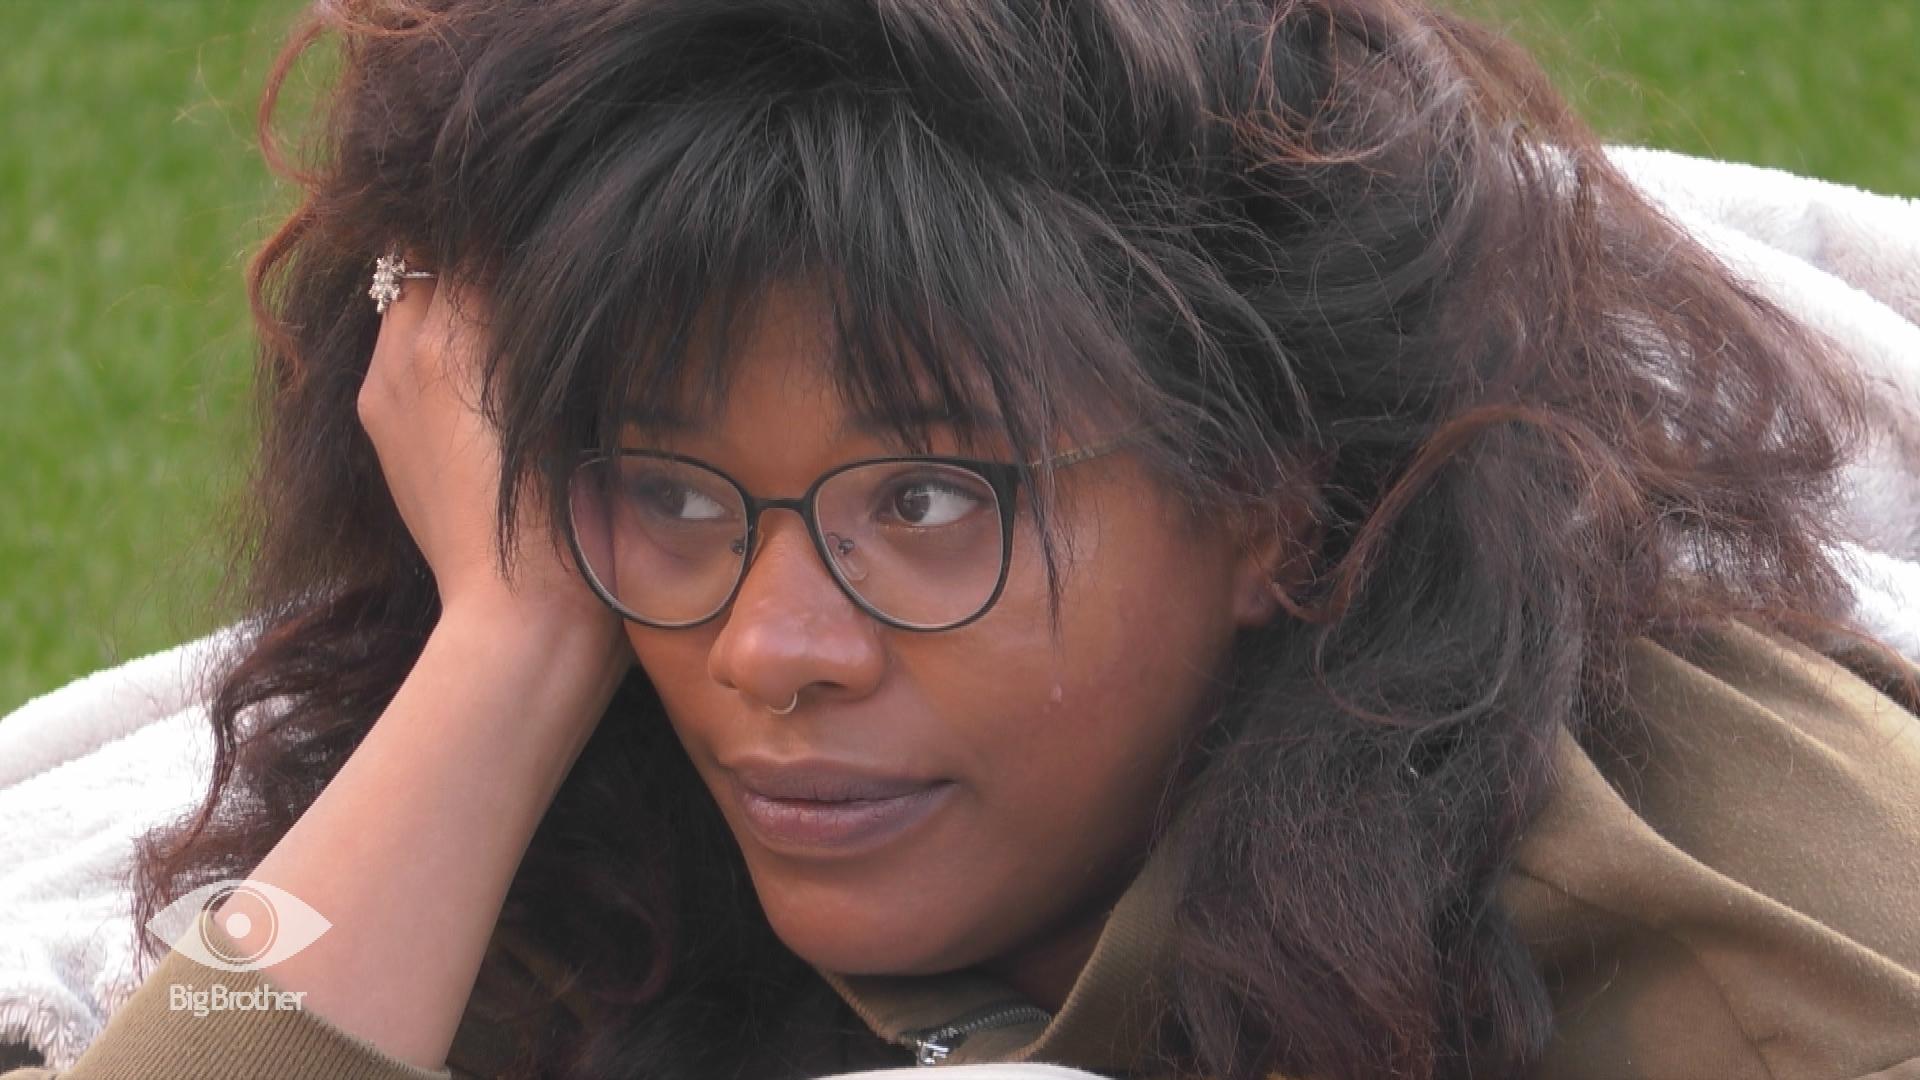 Big Brother 2020 Vanessa